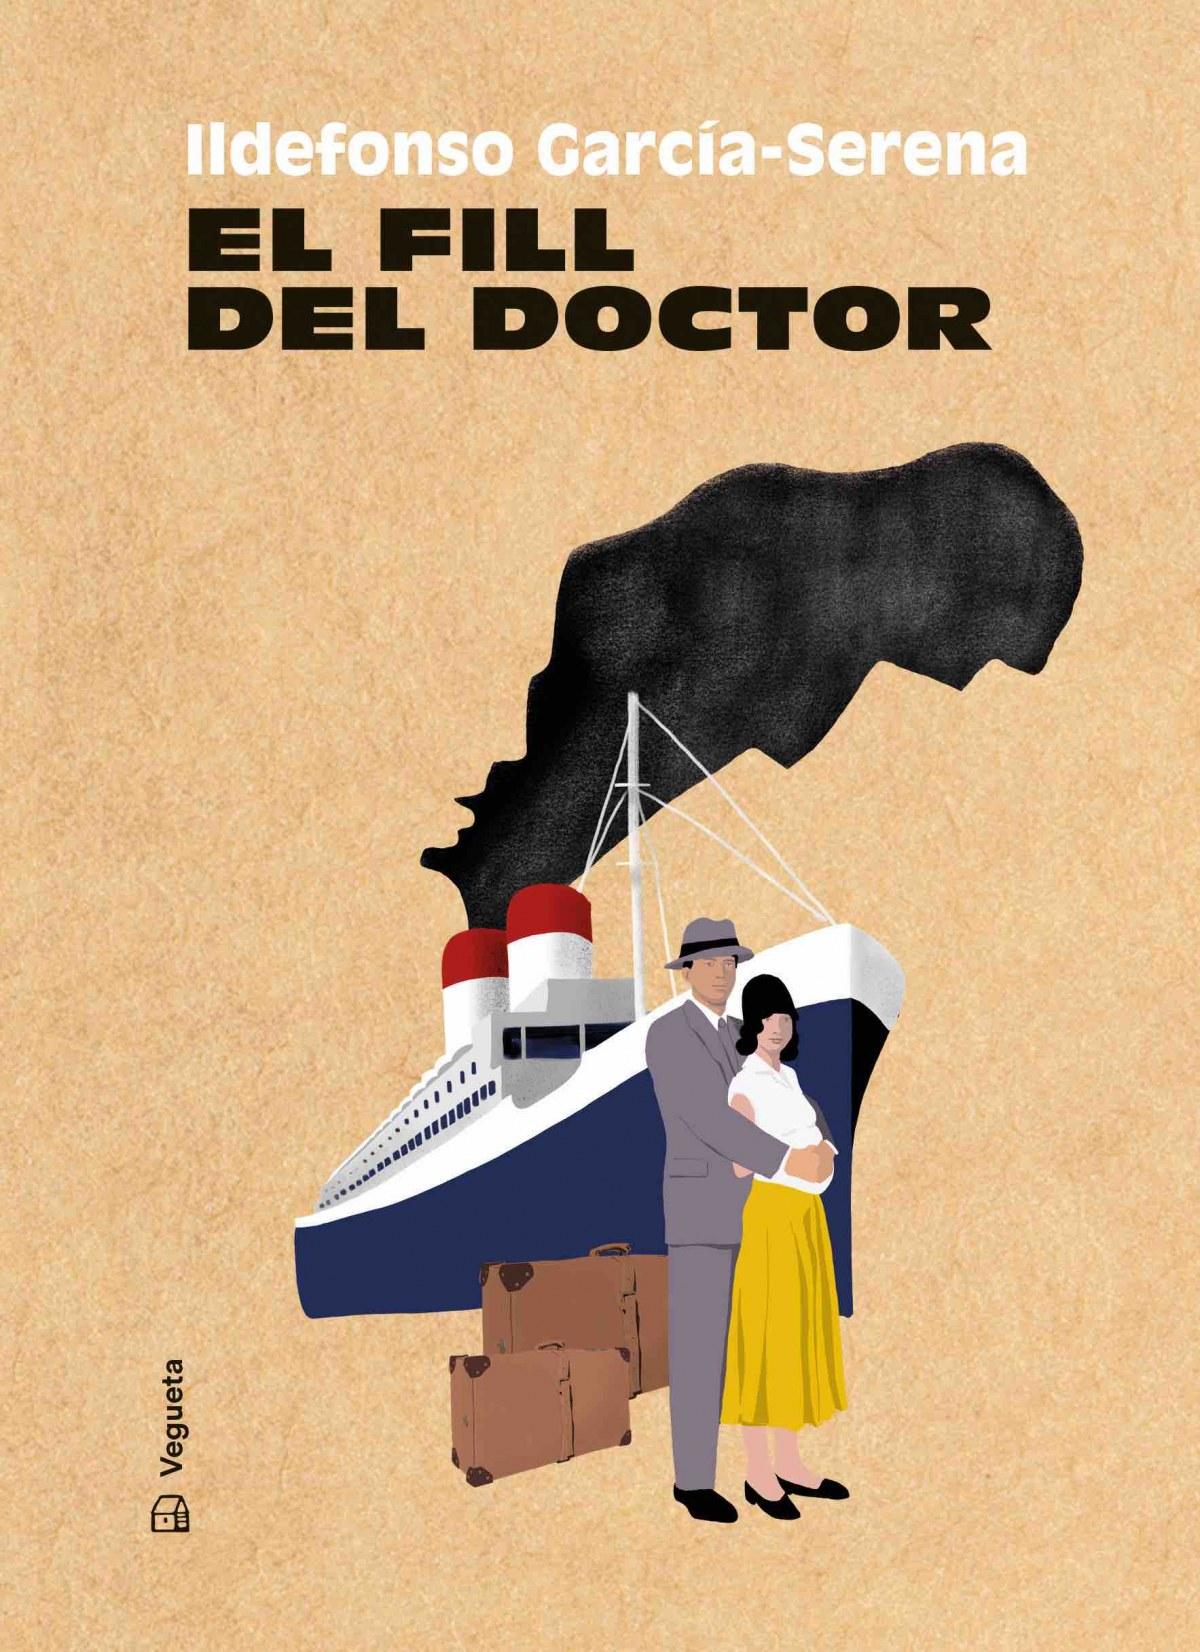 EL FILL DEL DOCTOR